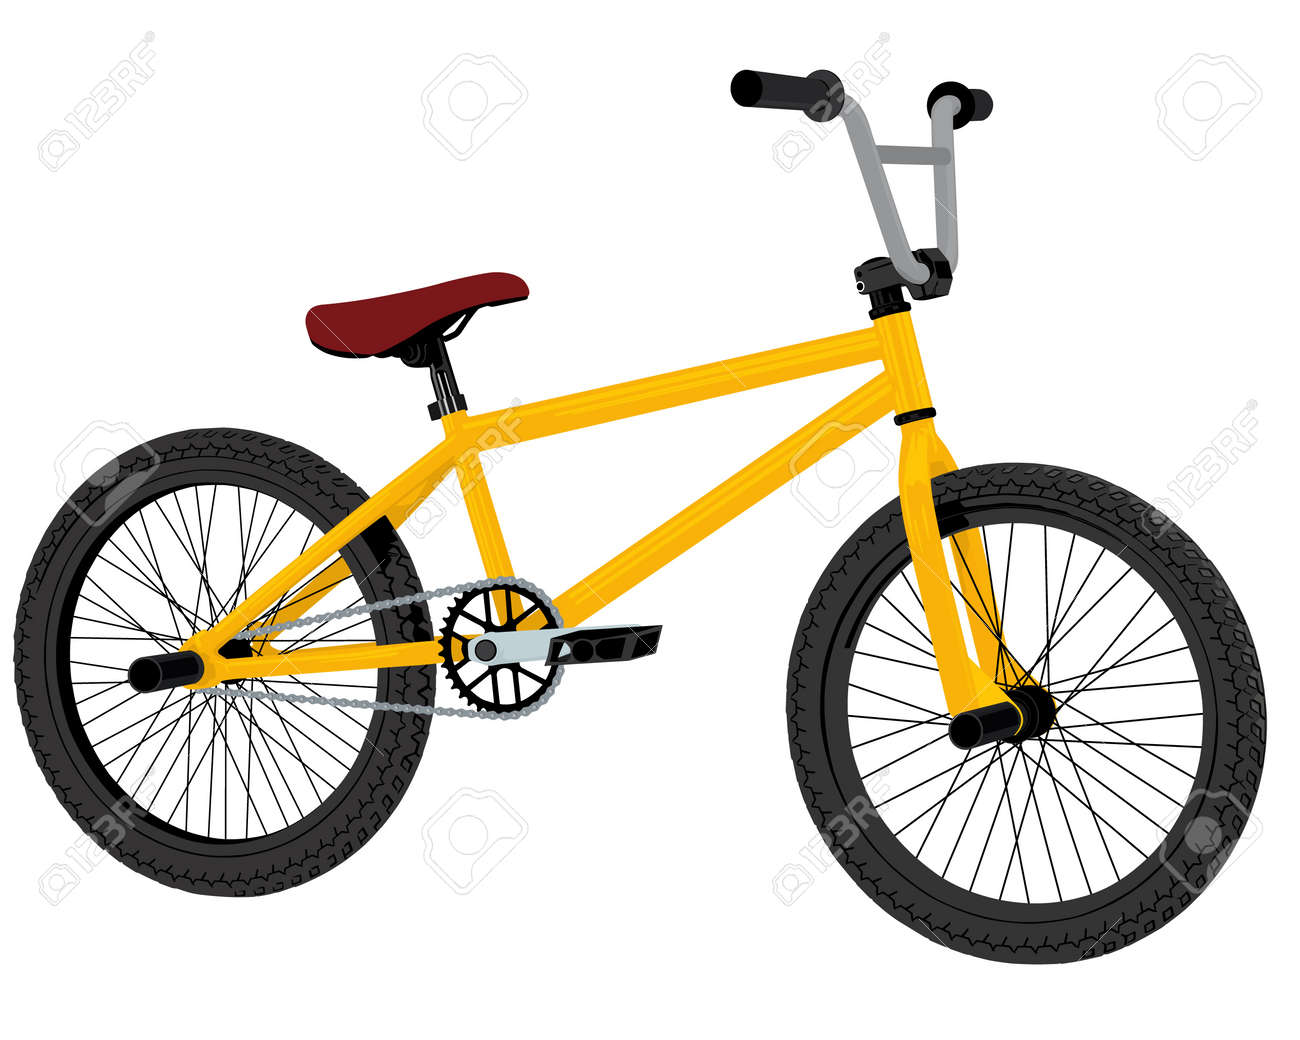 bmx bicycle Stock Vector - 12788268